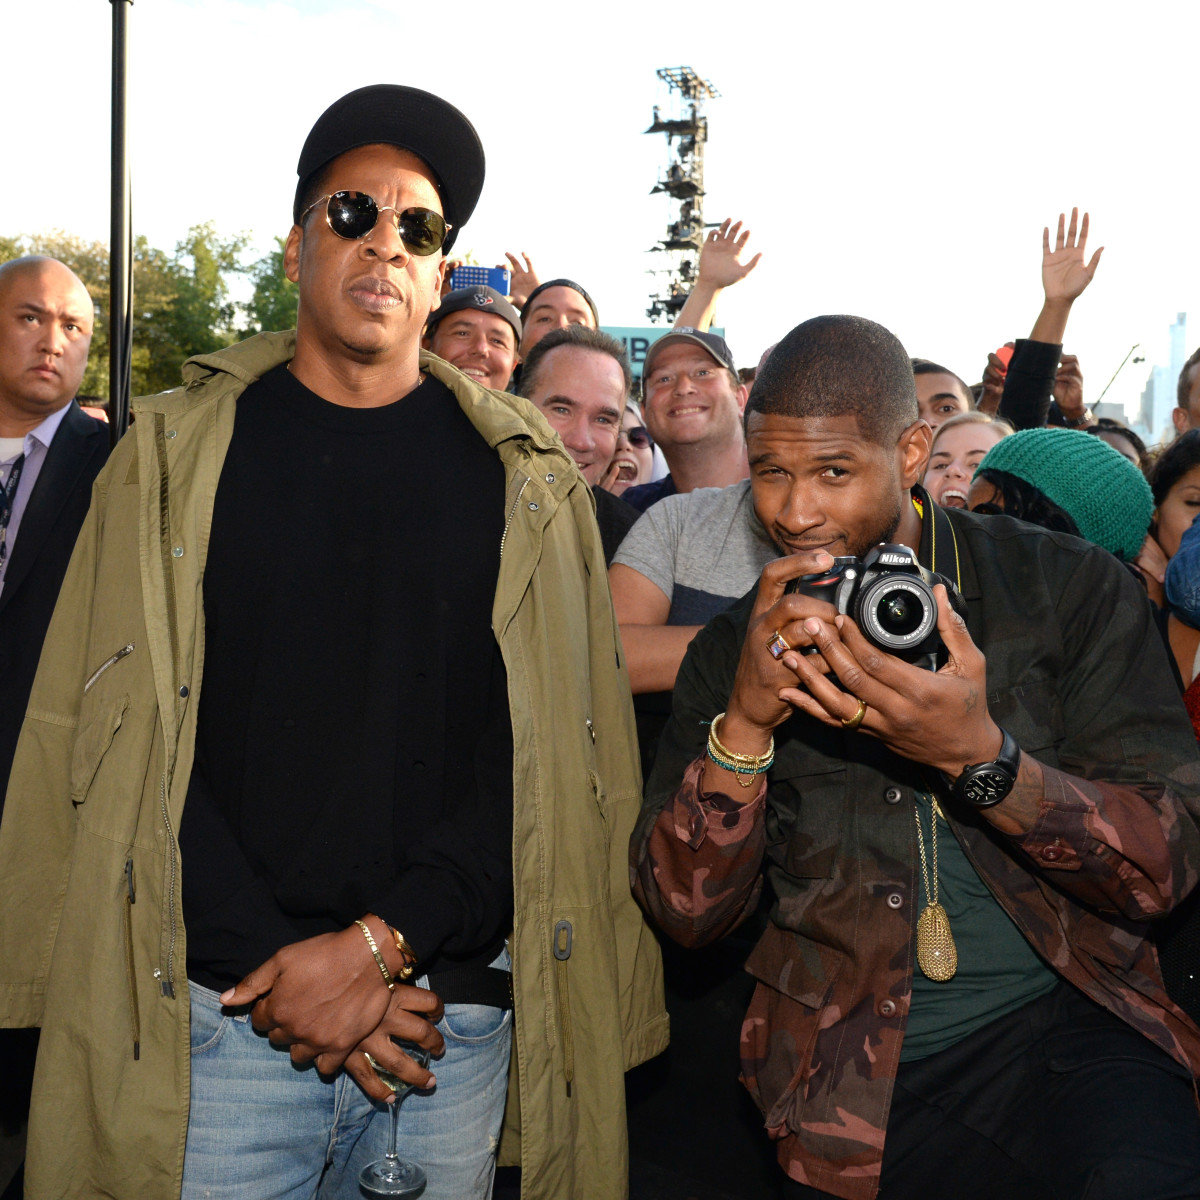 2015 Global Citizens Festival Jay Z and Usher